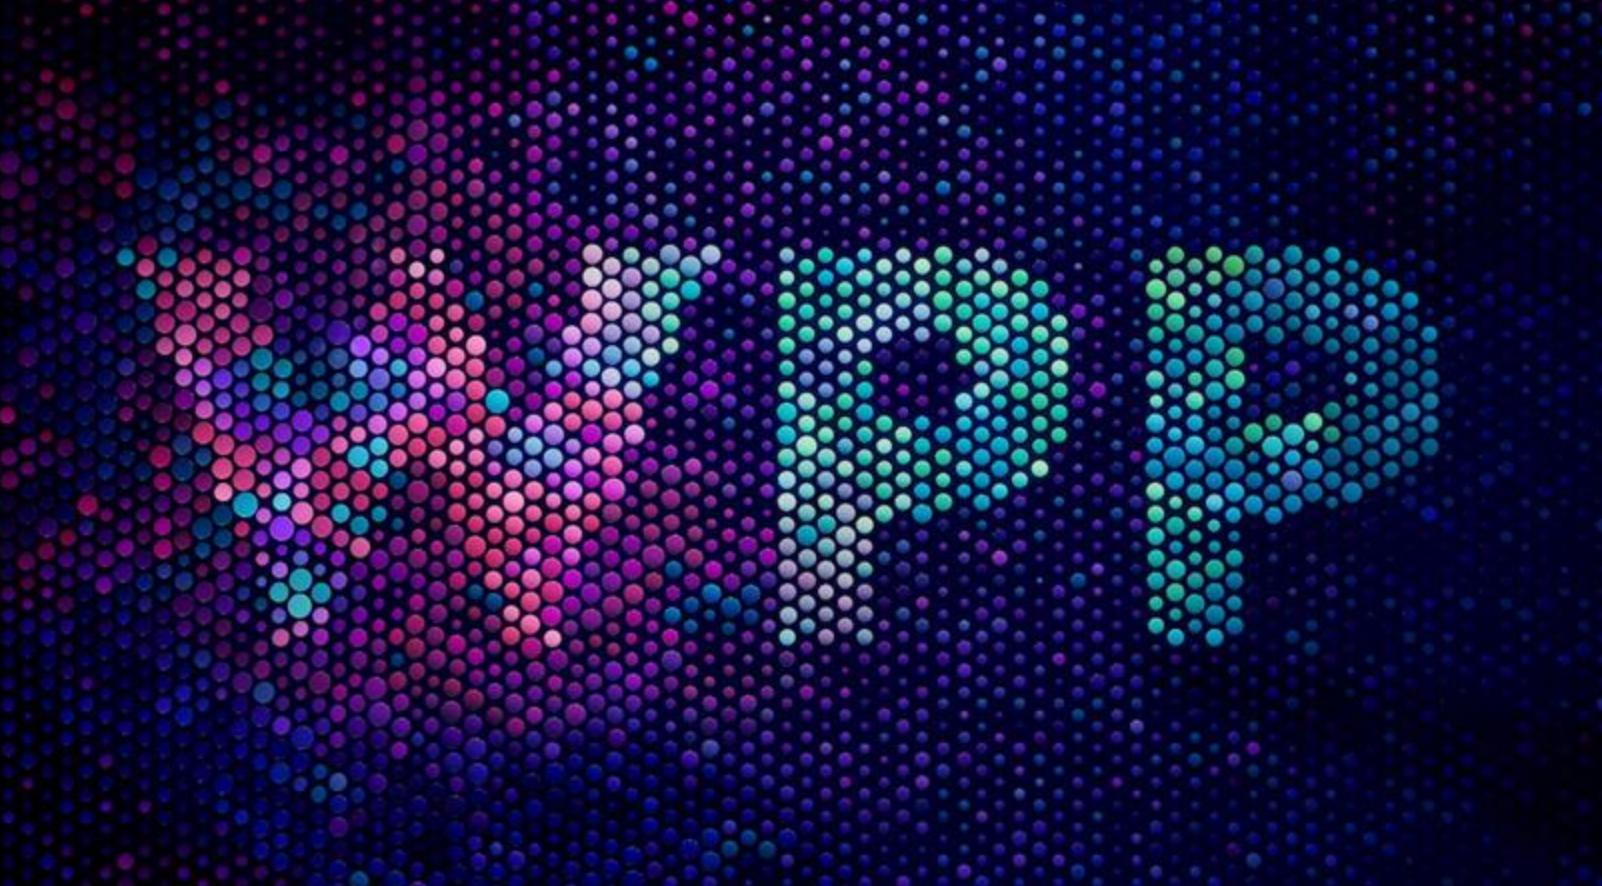 Coronavirus crisis:WPP worldwide cuts awards, travel, hotels, freezes hiring, reduces top salaries, reviews freelance expenditure